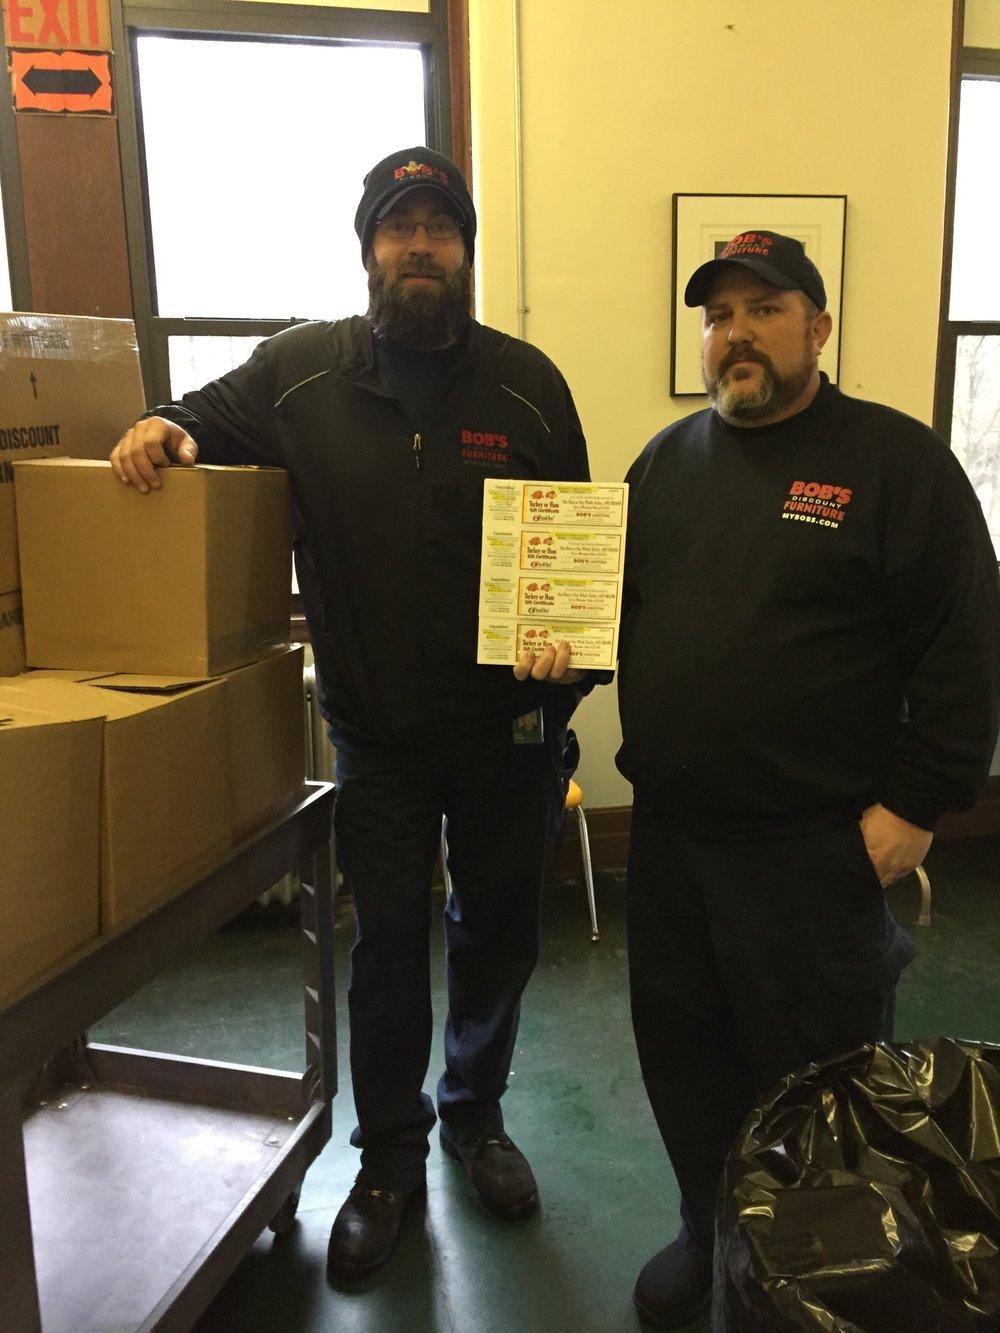 Bobs Discount furniture donations nov 2017.jpg